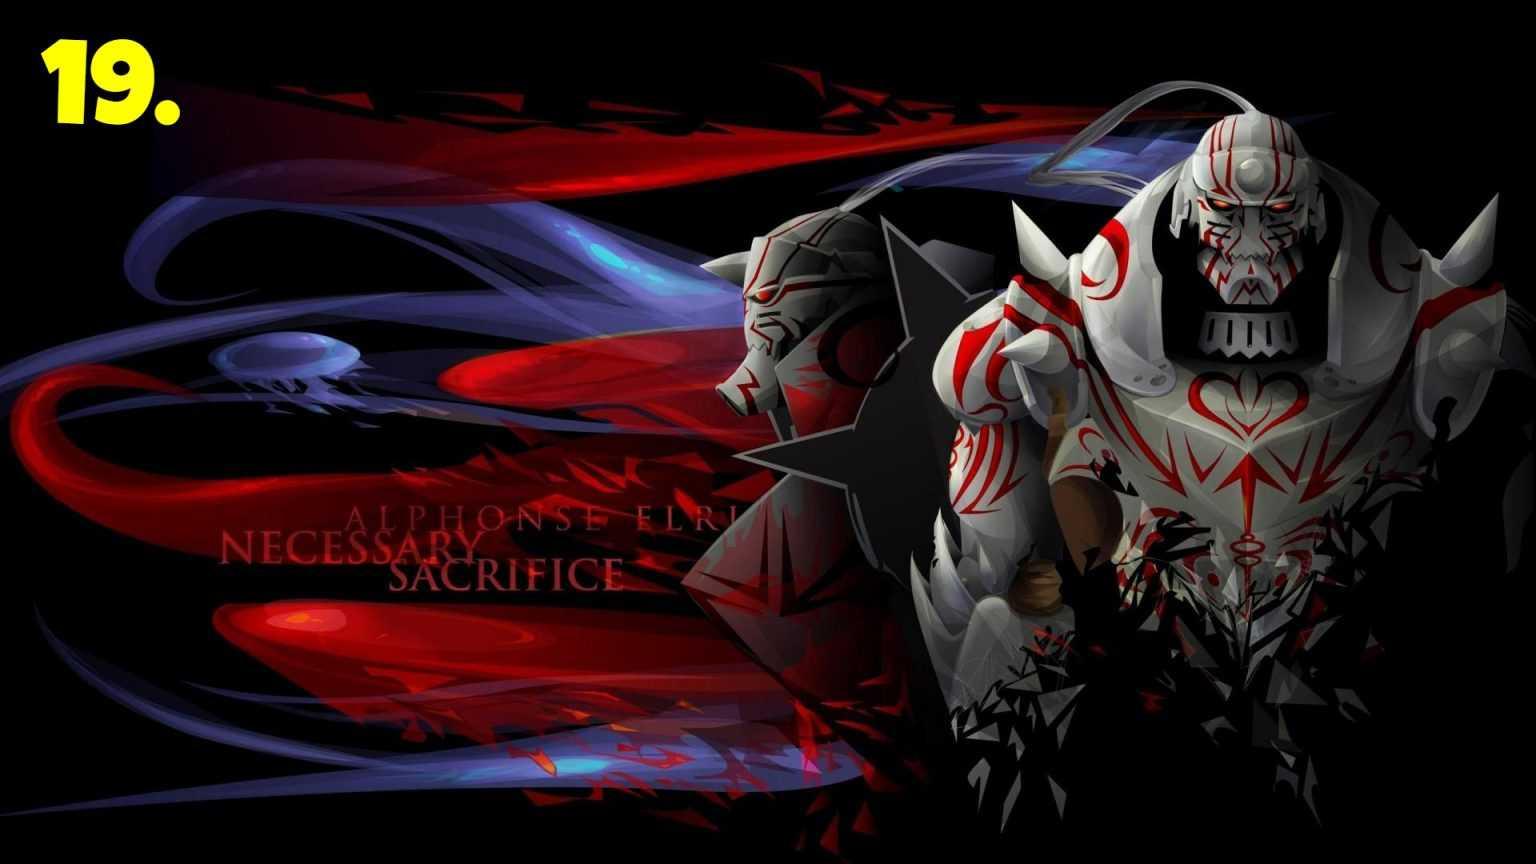 Alphonse-Elric-Fullmetal-Alchemist